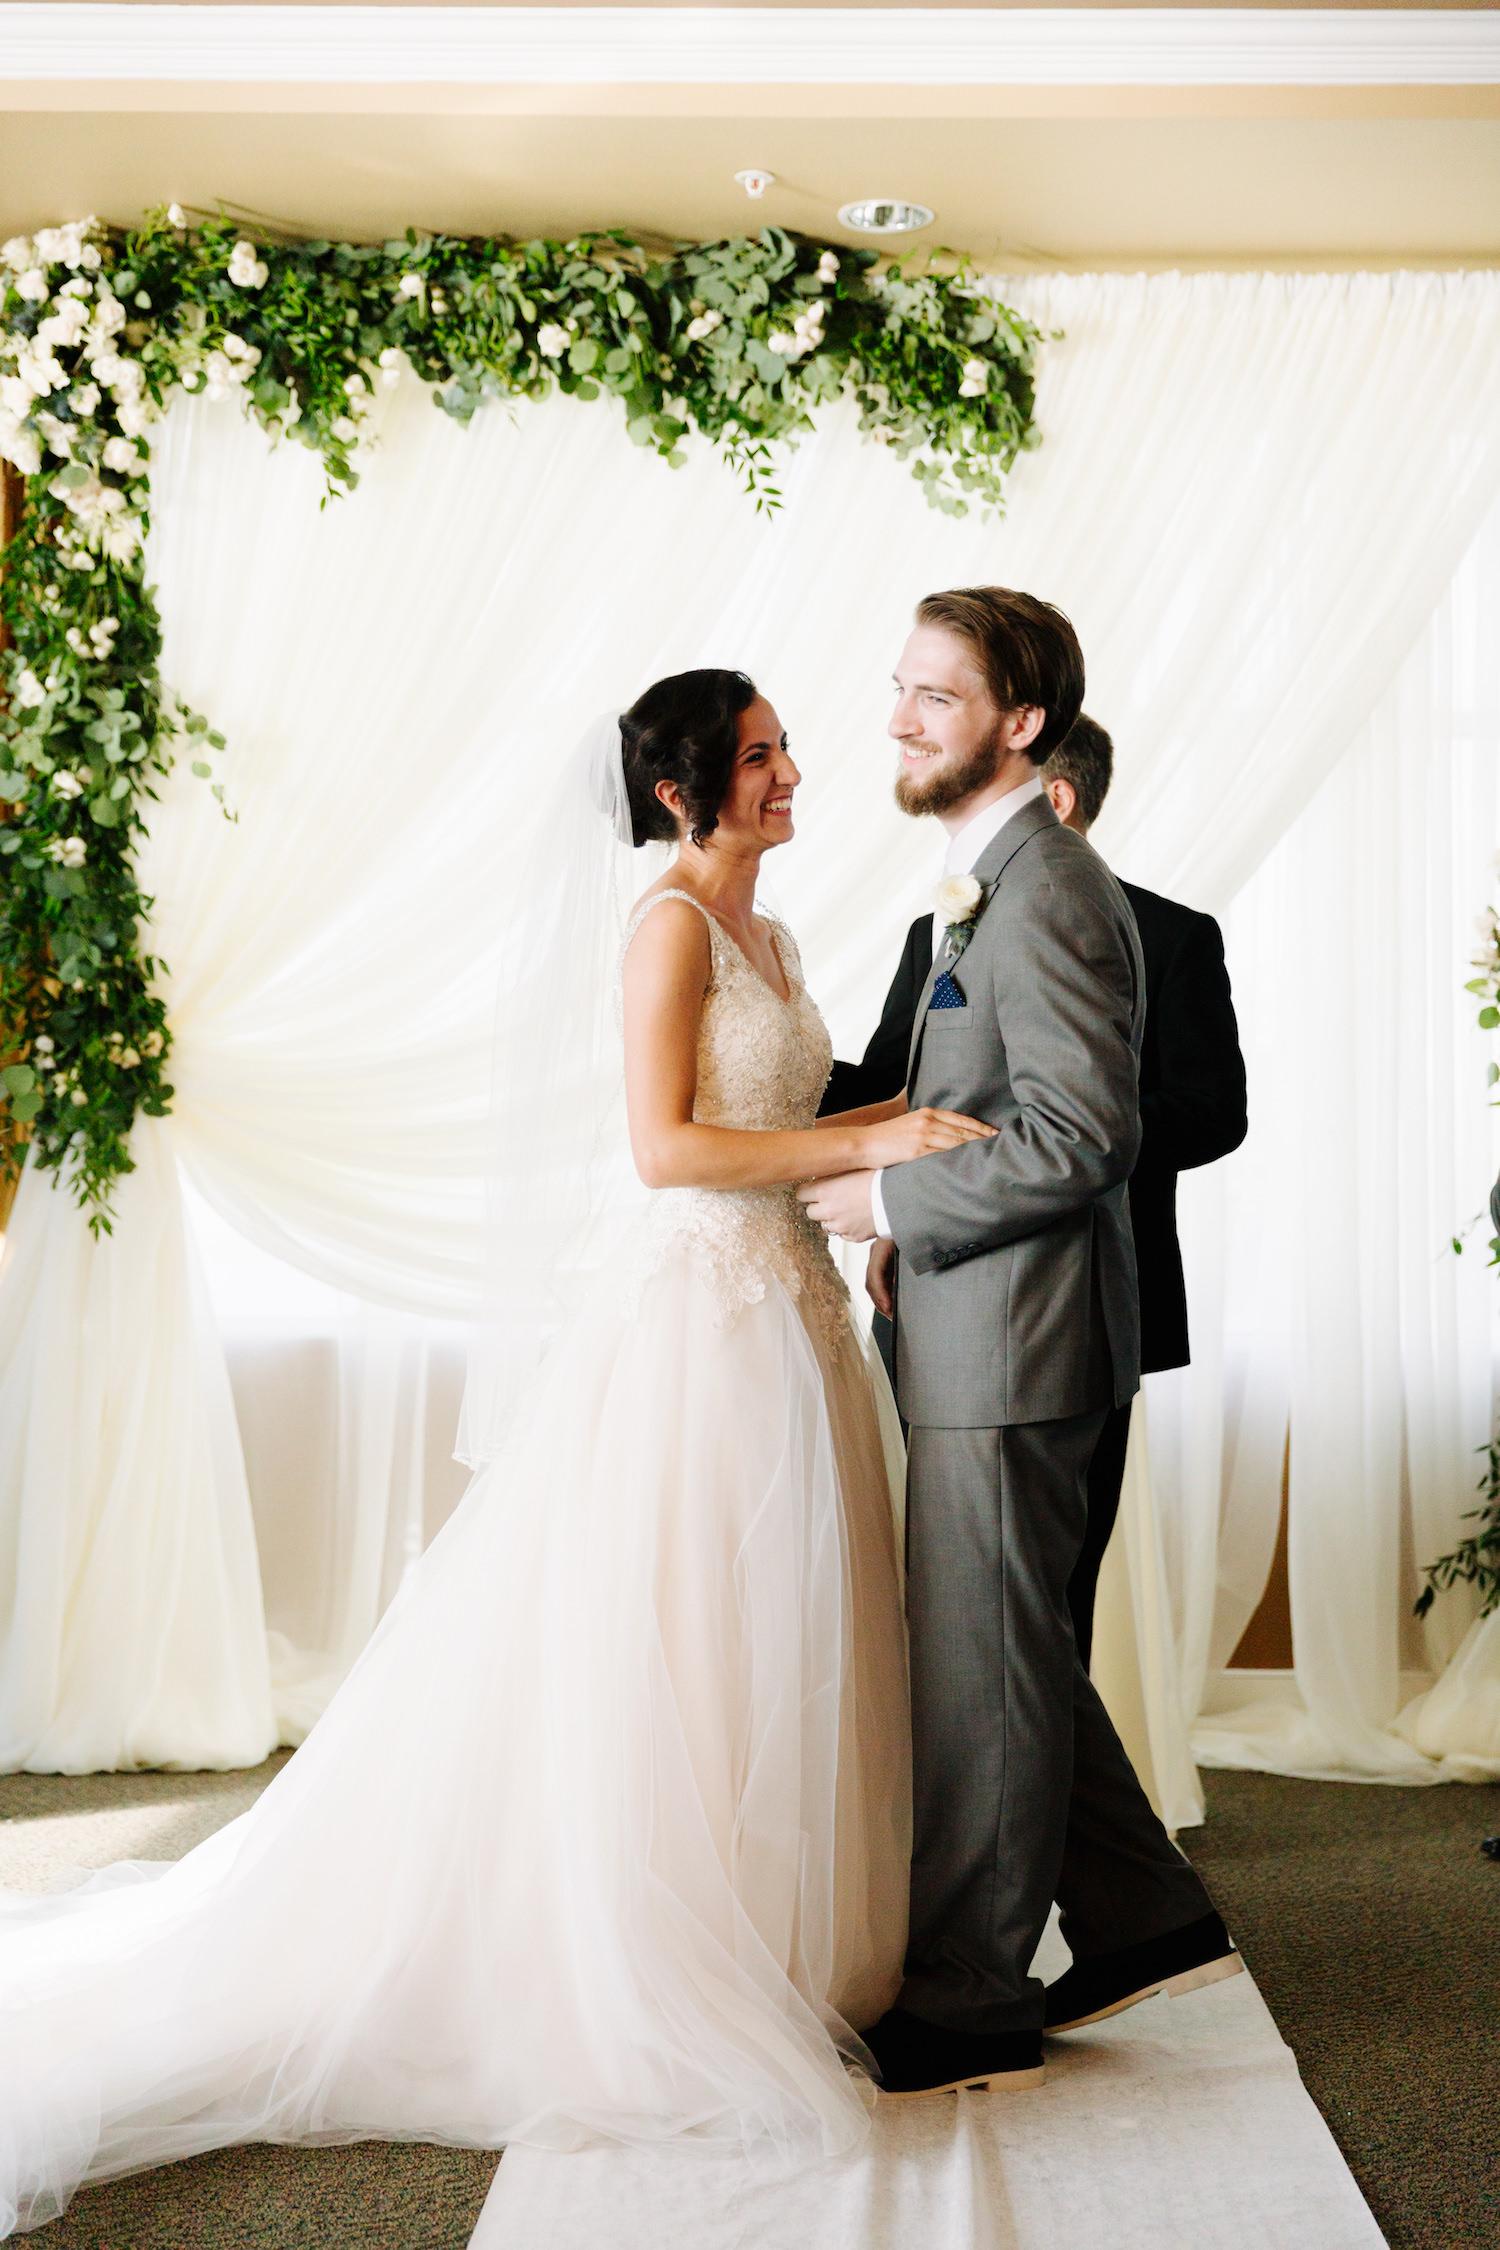 Jared _ Melissa - Ceremony - Jake _ Katie Photography_248.jpg